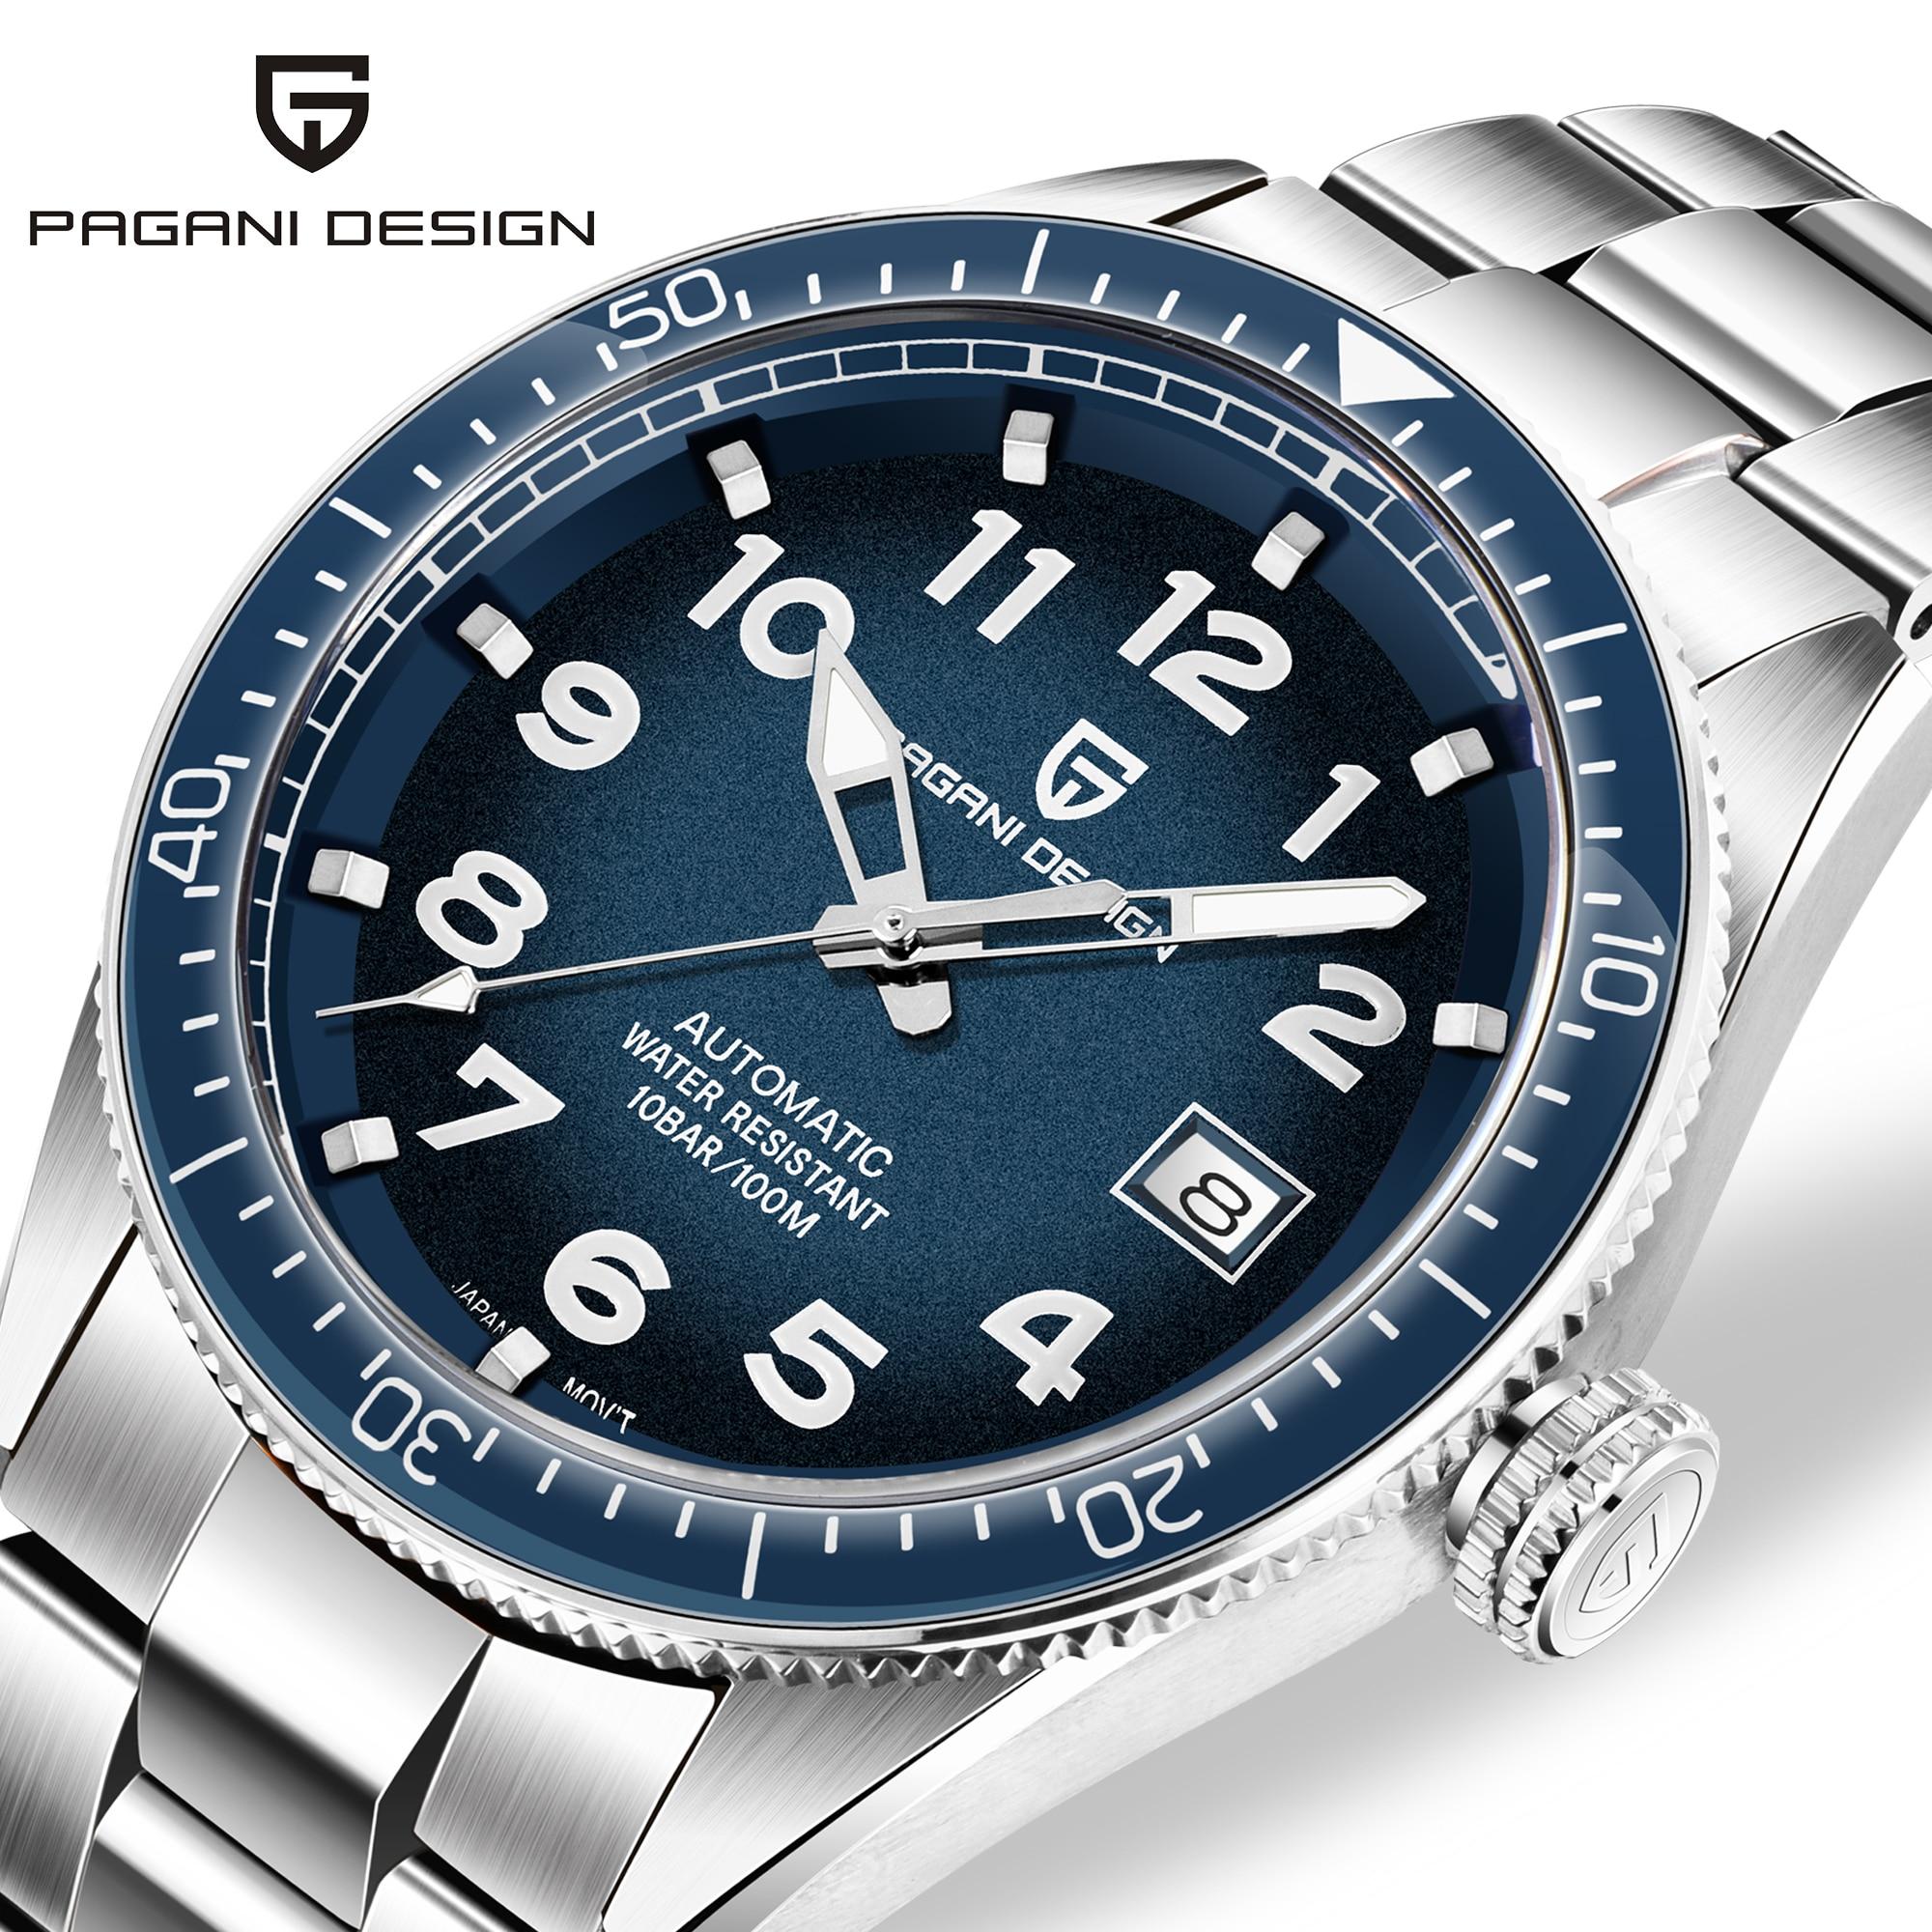 Waterproof Watch Mechanical-Watch Pagani-Design Automatic Business Men Brand Luxury Relojes